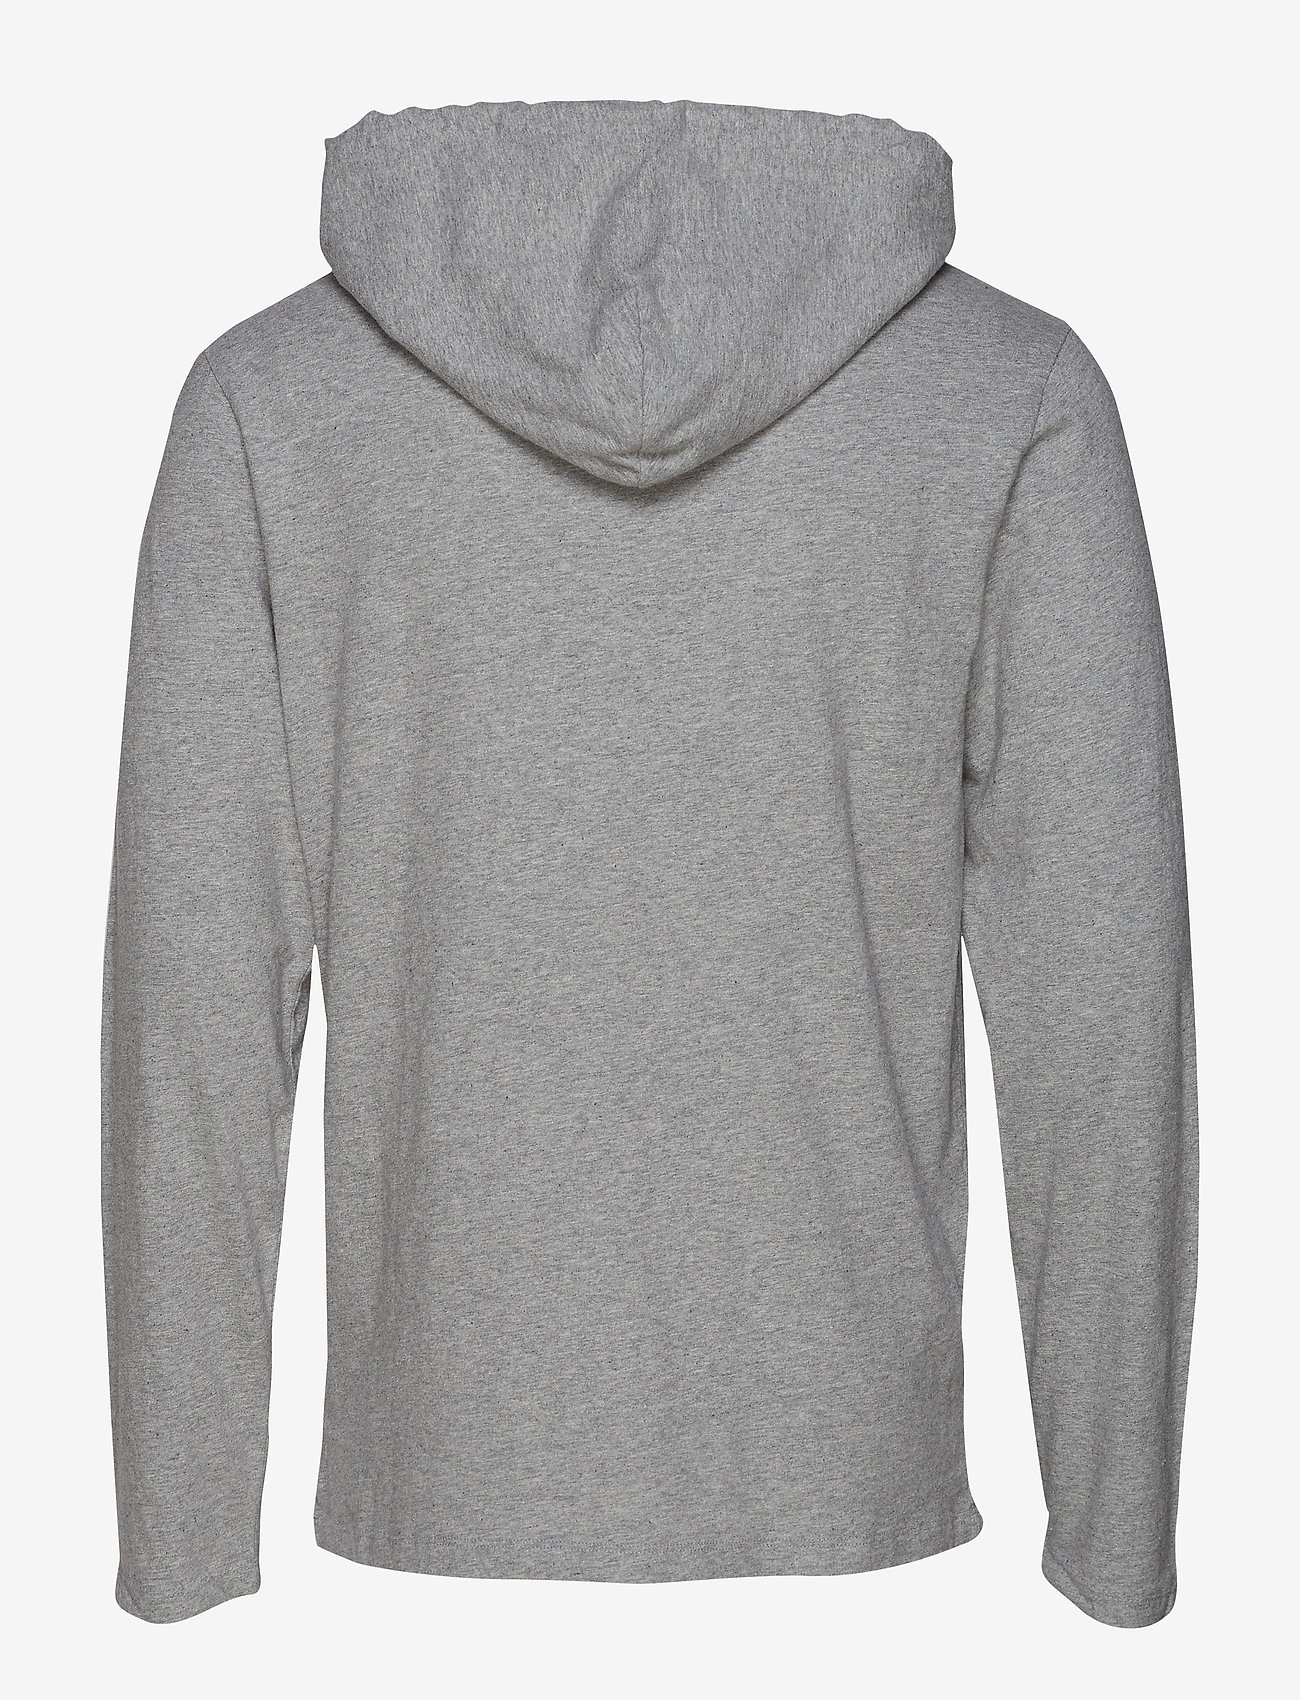 Polo Ralph Lauren Lspohoodm3-long Sleeve-t-shirt - Sweatshirts Andover Heather